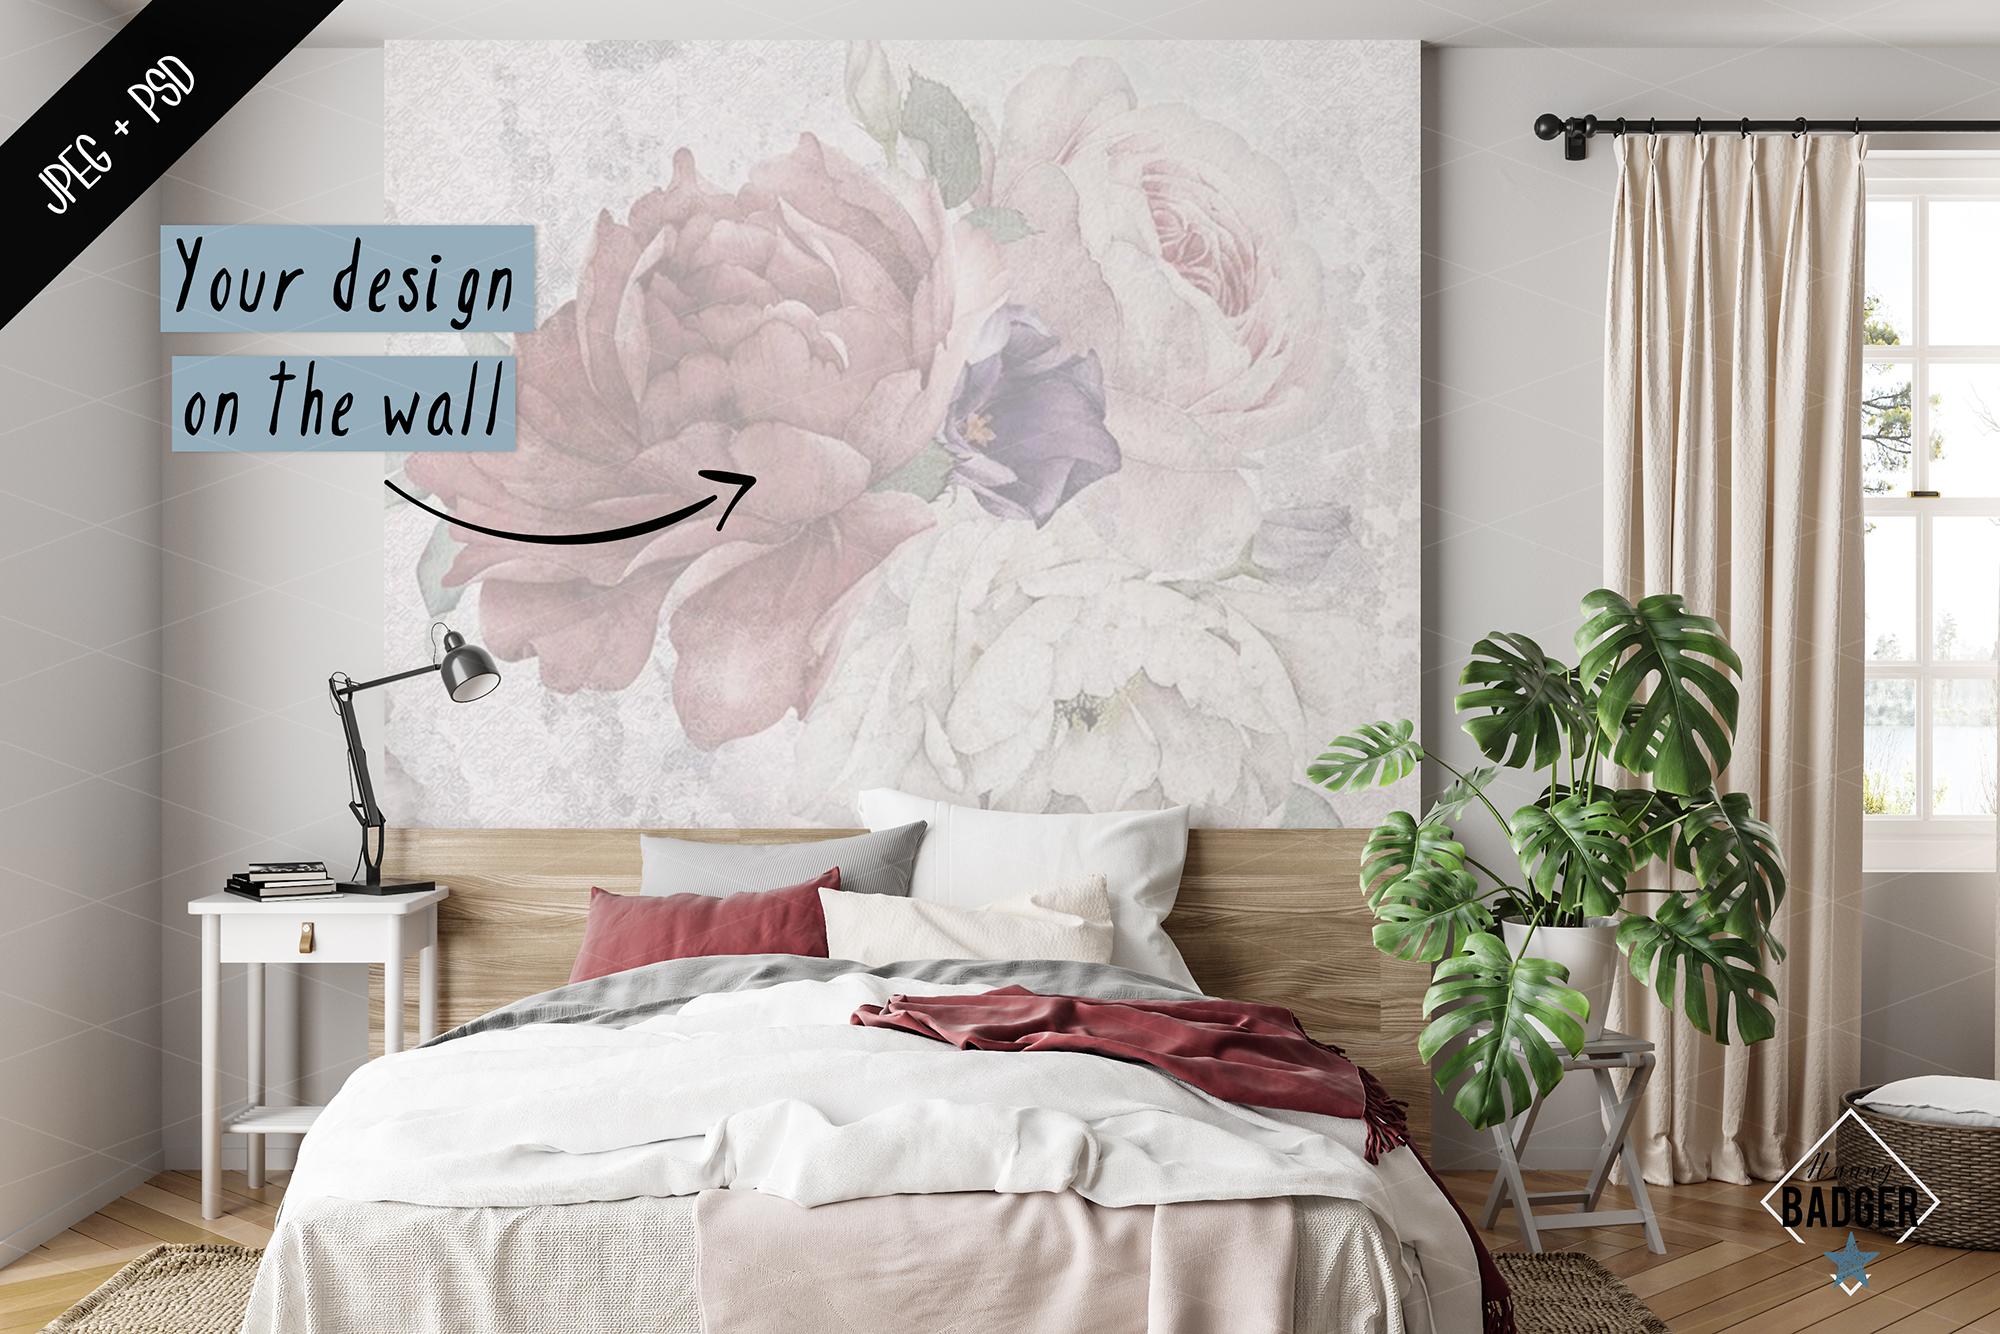 Interior mockup BUNDLE - frame & wall mockup creator example image 6